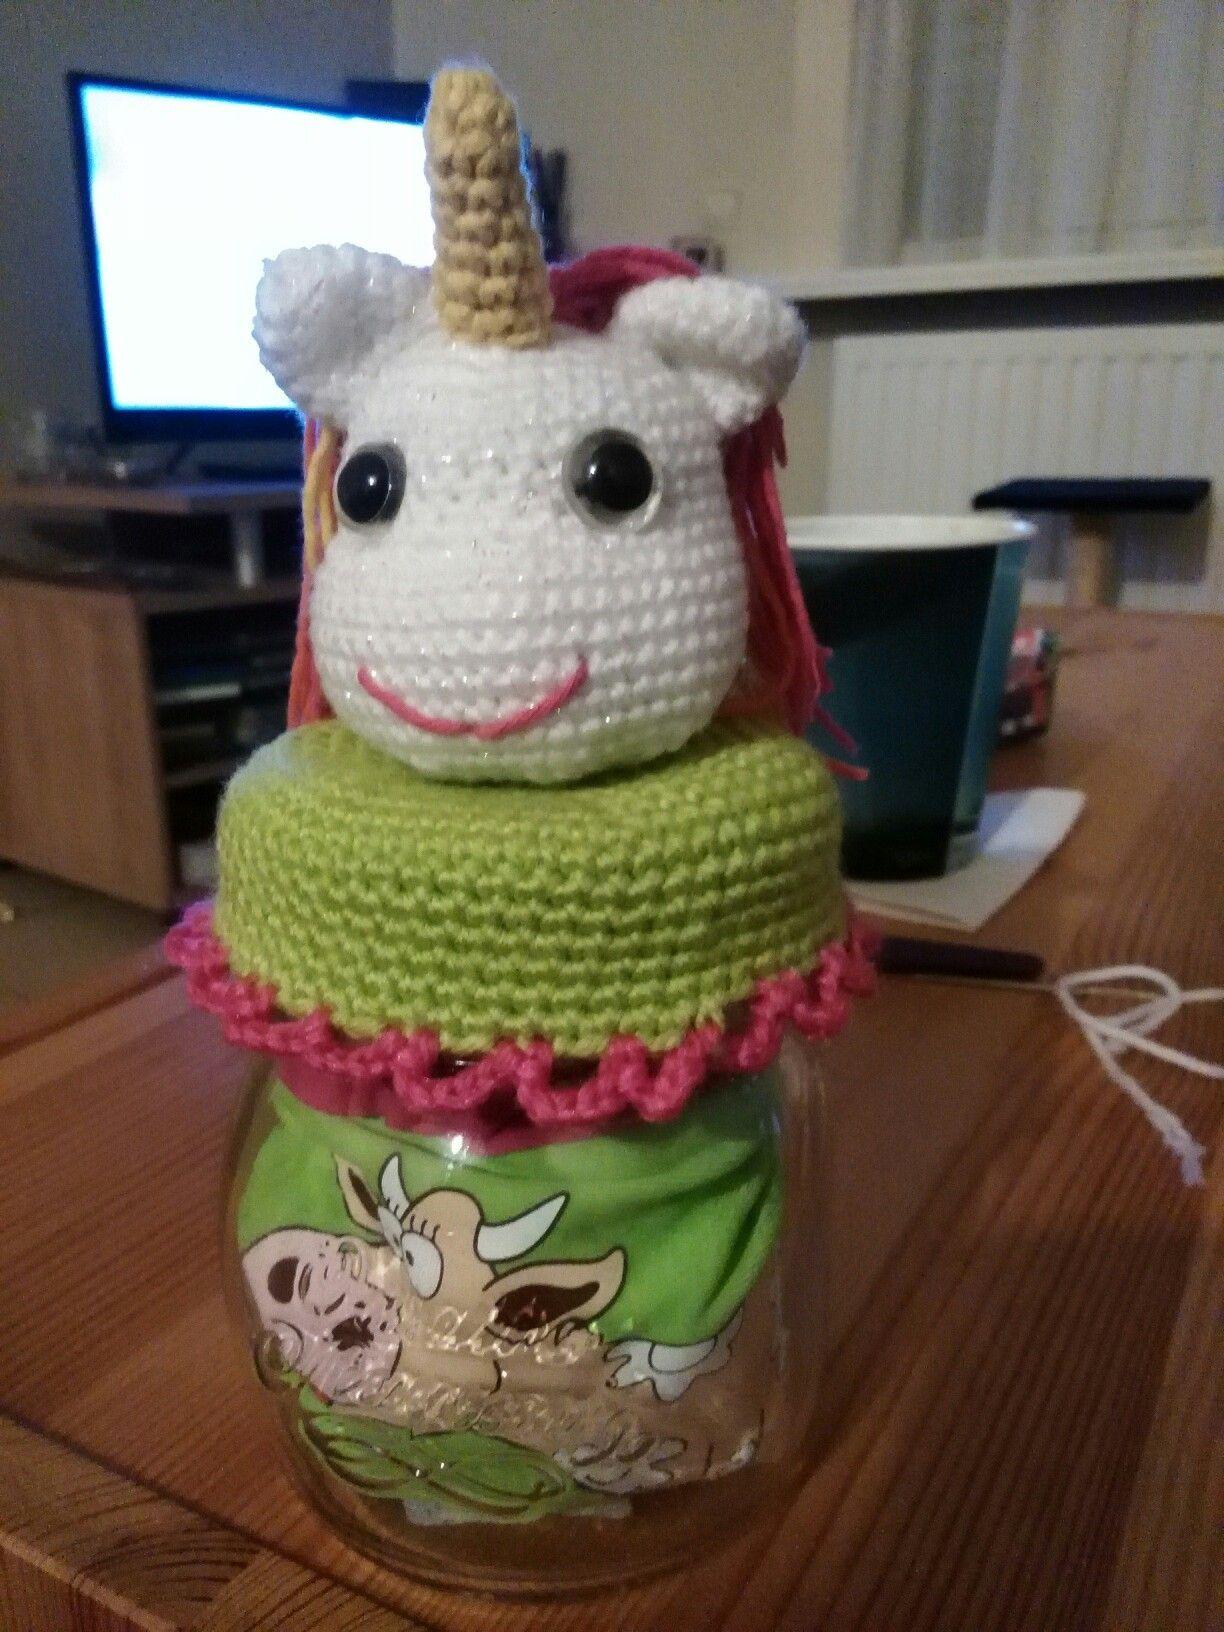 Geboorte Baby Potje Deksel Haken Gifts Crochet Crochet Kitchen